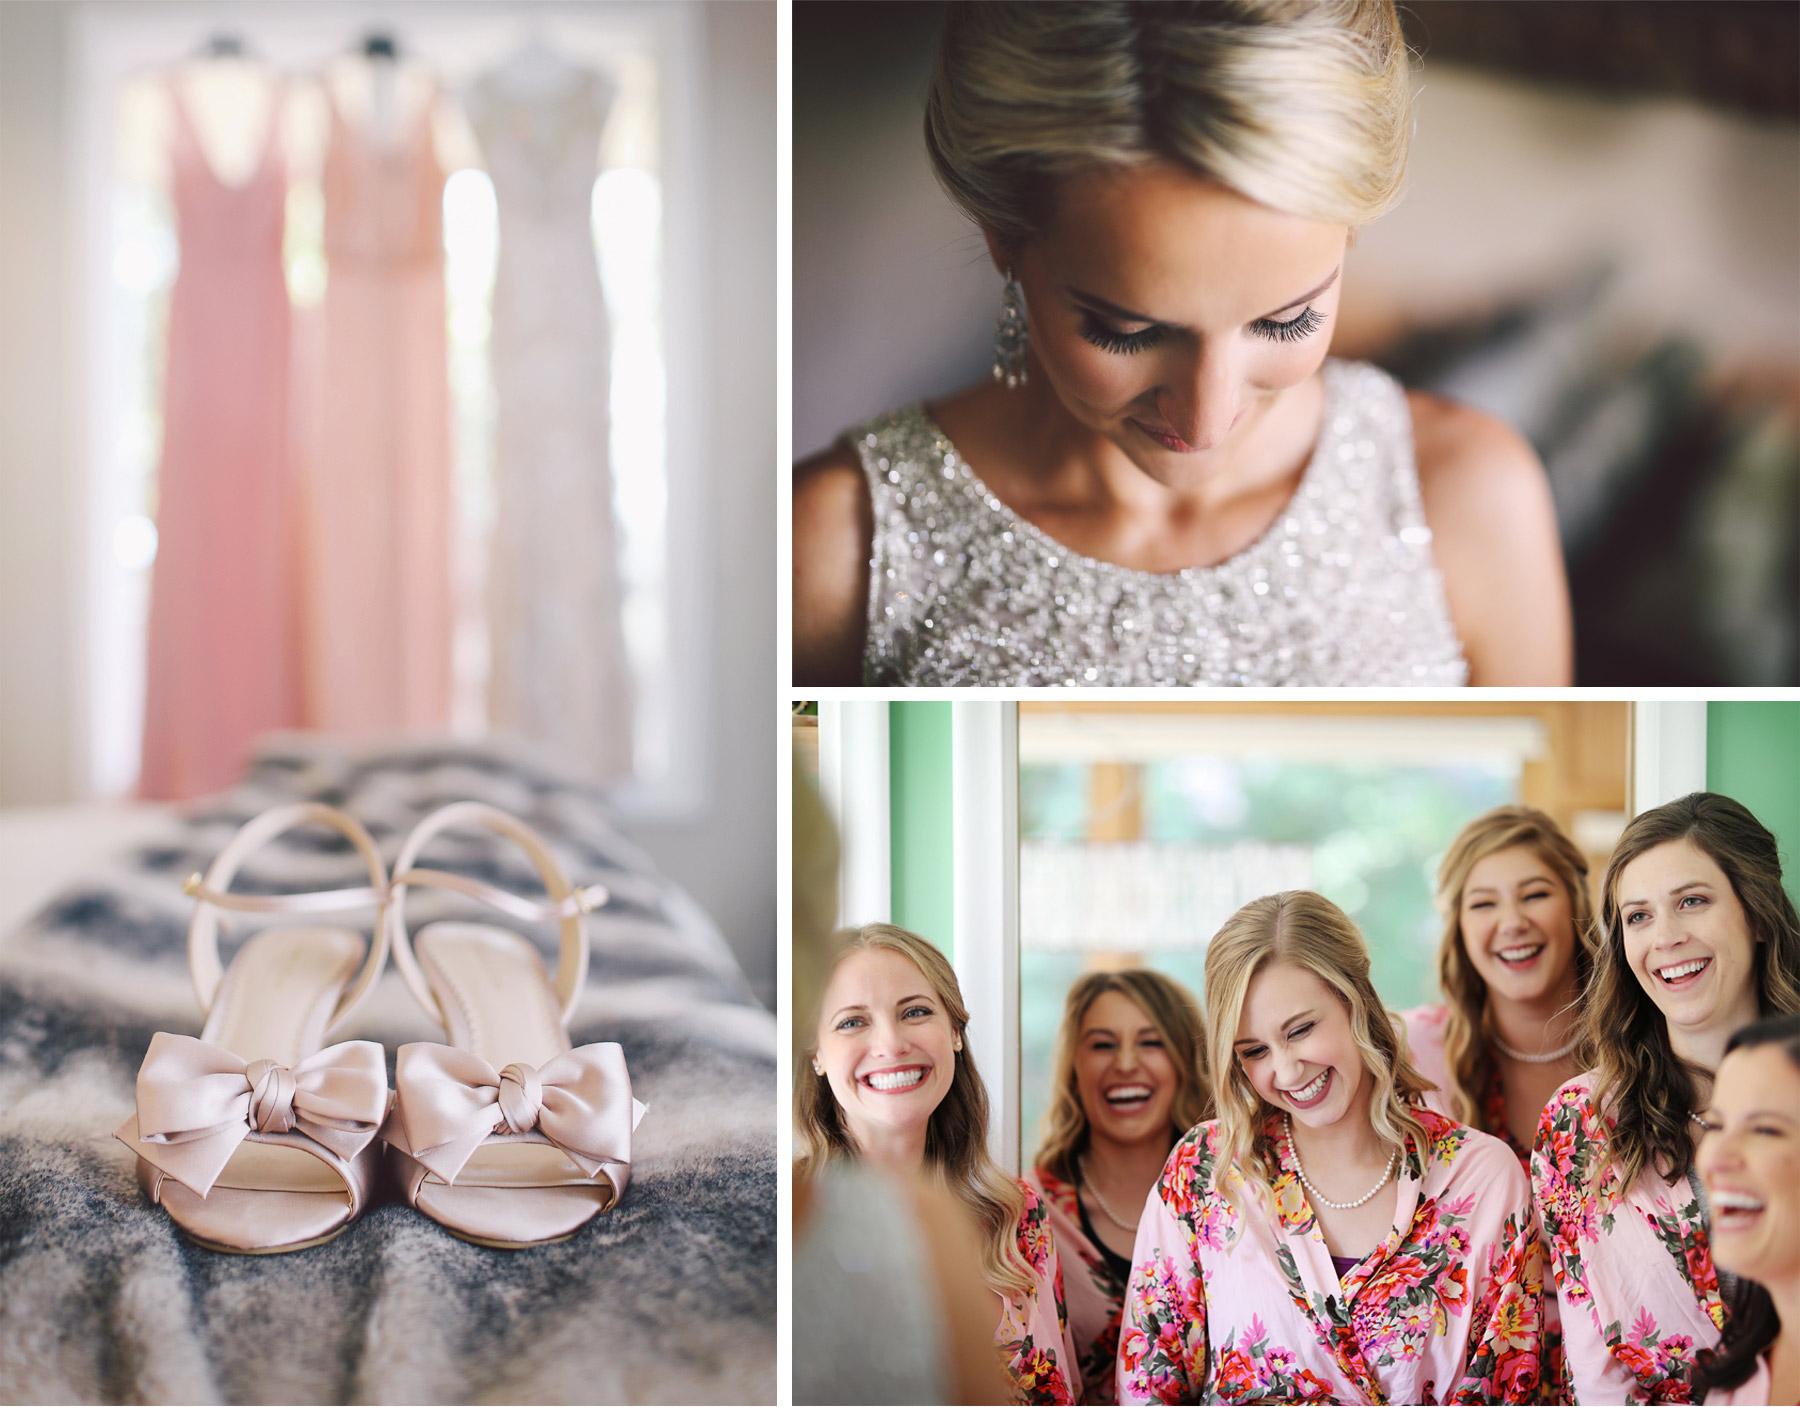 01-Minneapolis-Minnesota-Wedding-Photography-by-Vick-Photography-Getting-Ready-Dress-Shoes-Bridesmaids-Jenna-and-Josh.jpg